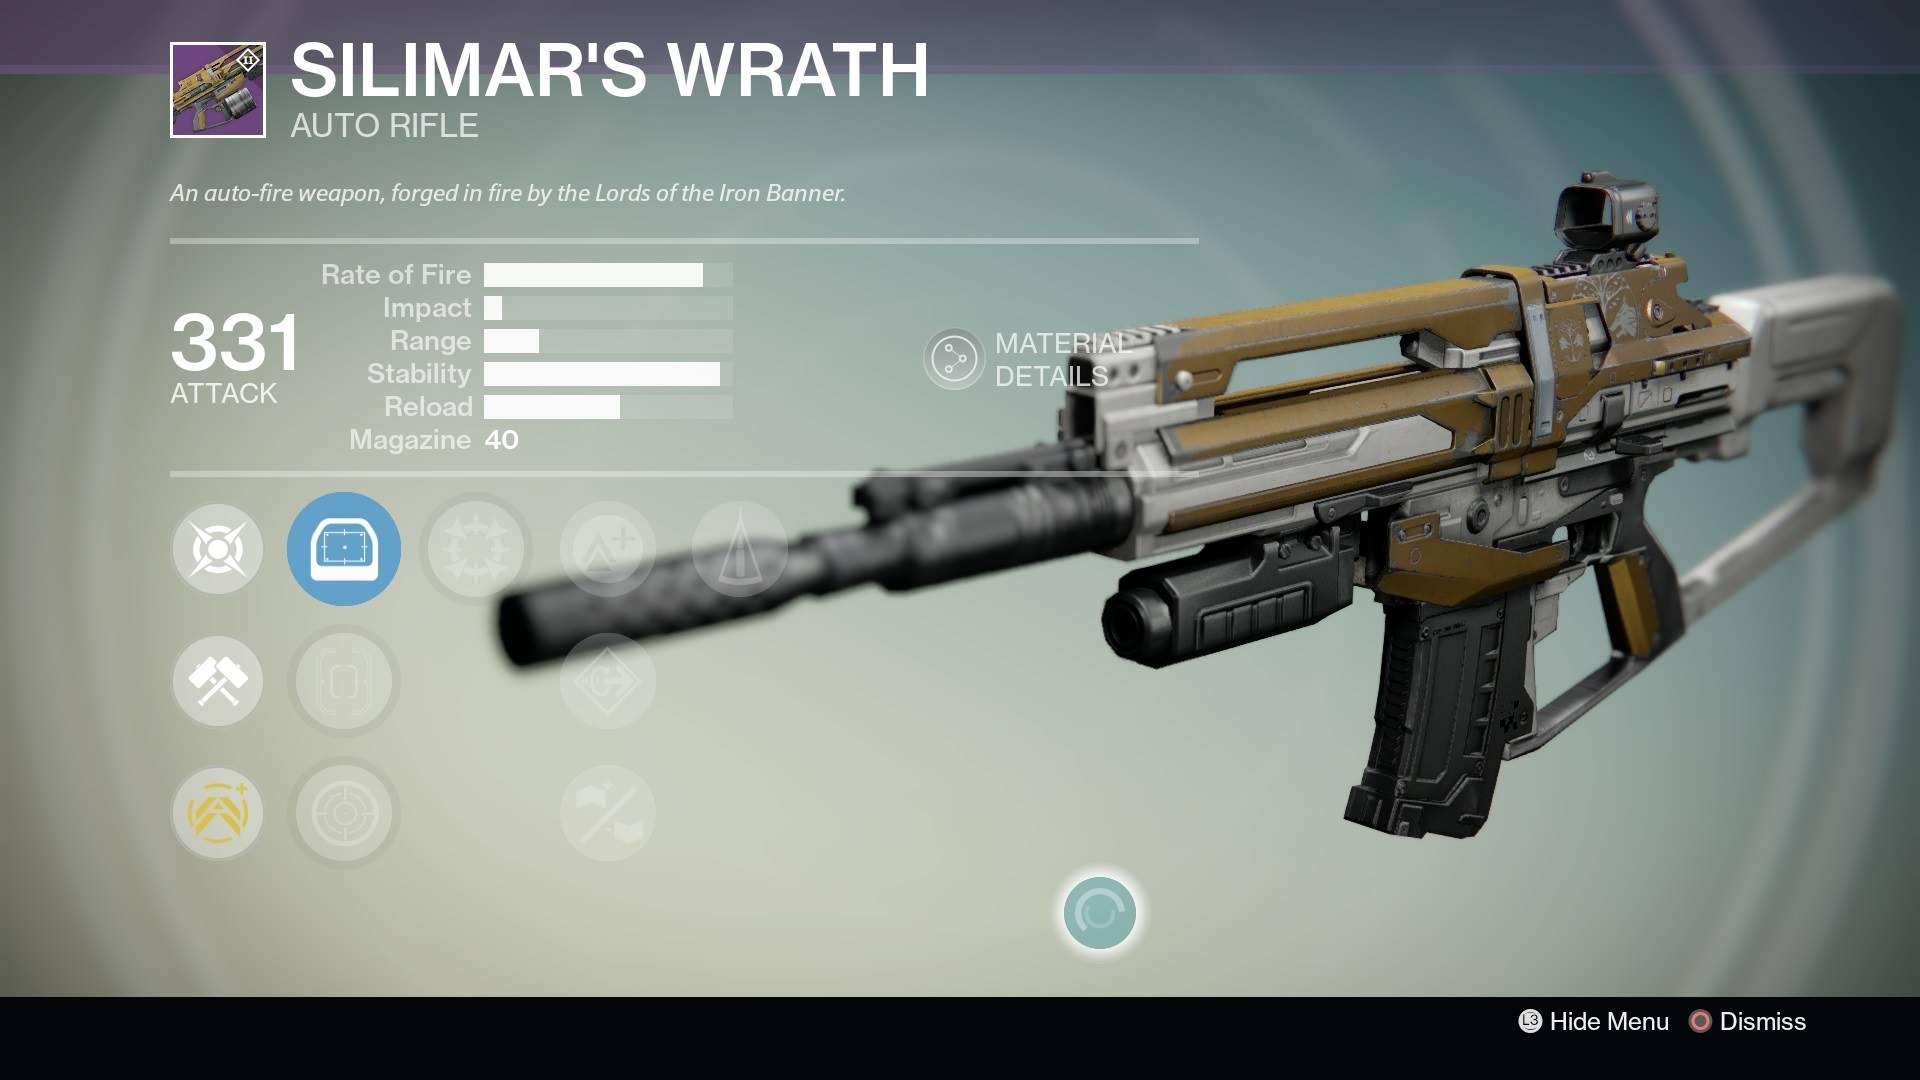 Destiny - Silimar's Wrath Auto Rifle